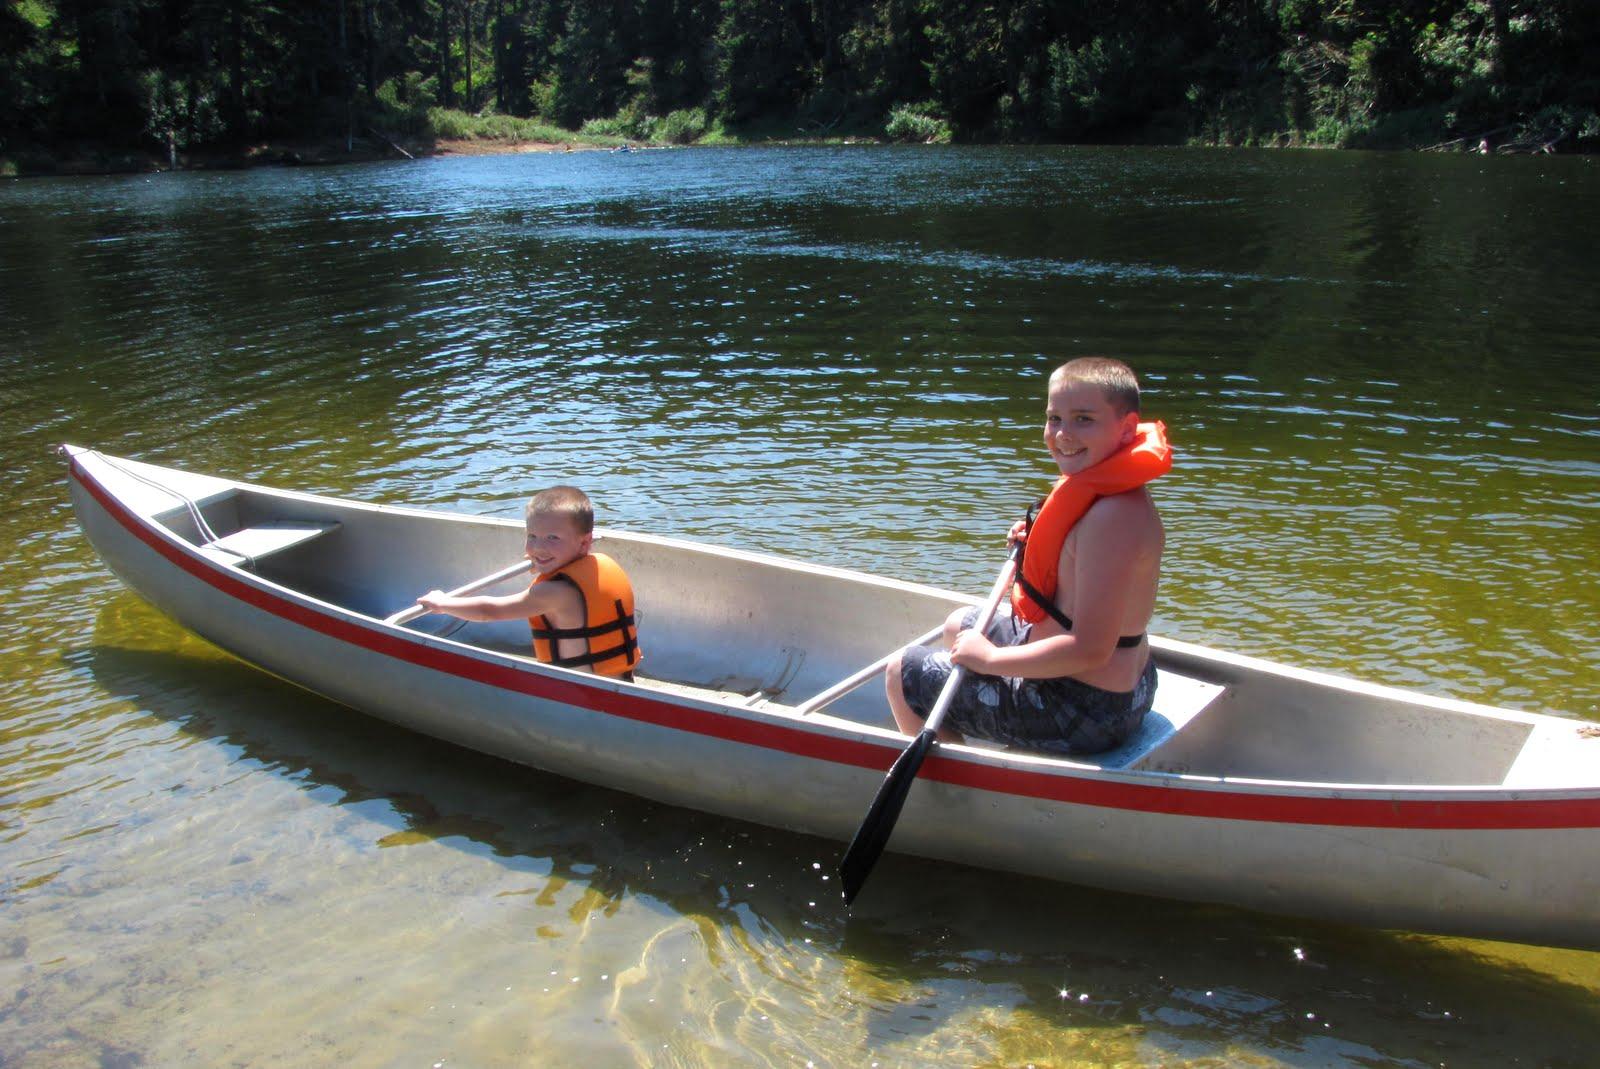 Jod la mode to the beach for Canoe vs kayak fishing